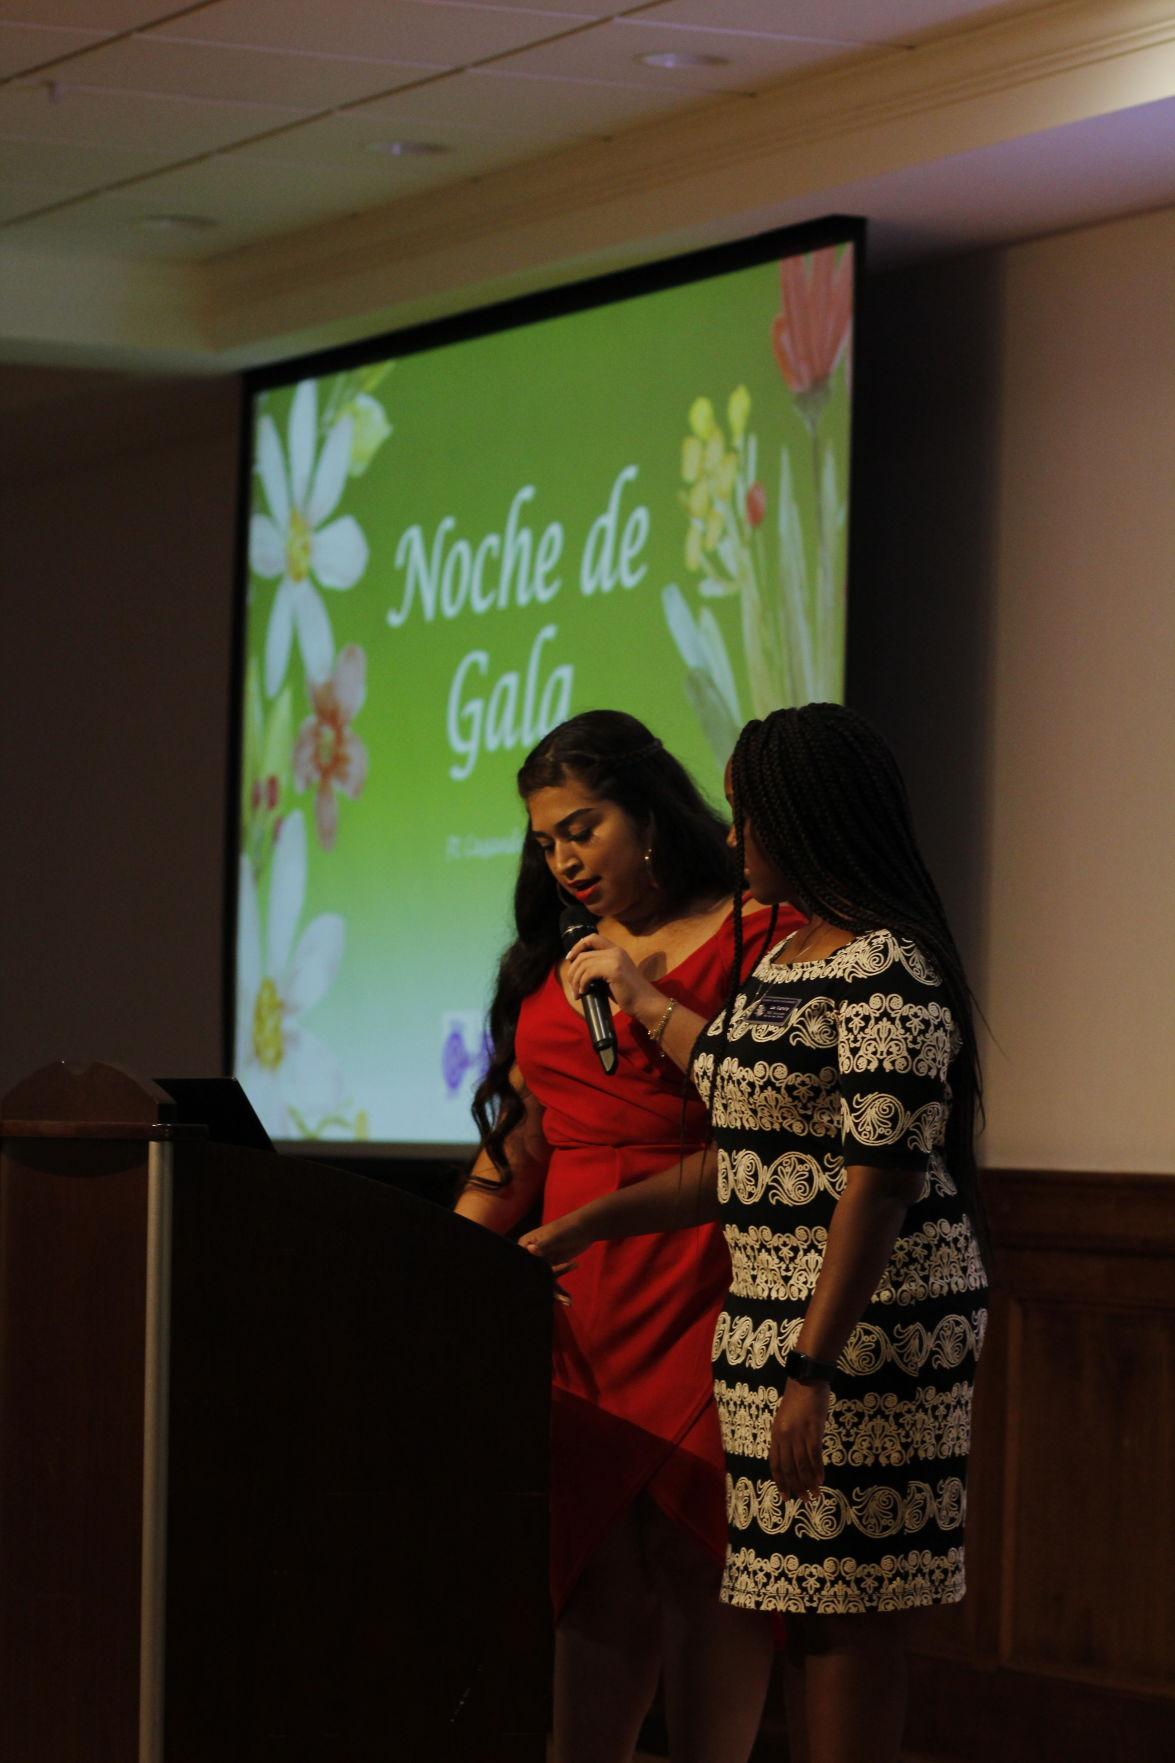 Noche de Gala celebrates Latinx students